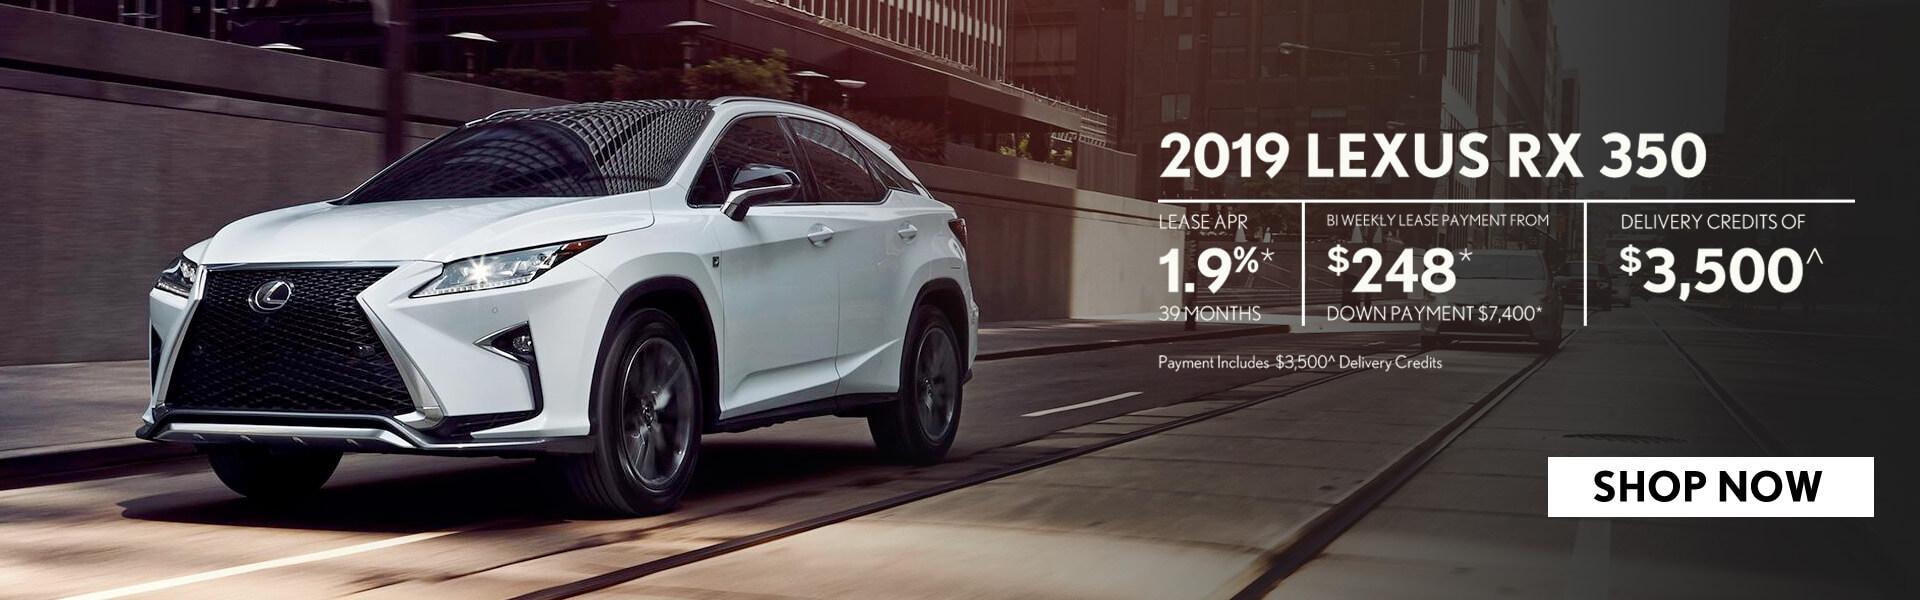 2019 Lexus RX Series for sale in Edmonton, AB